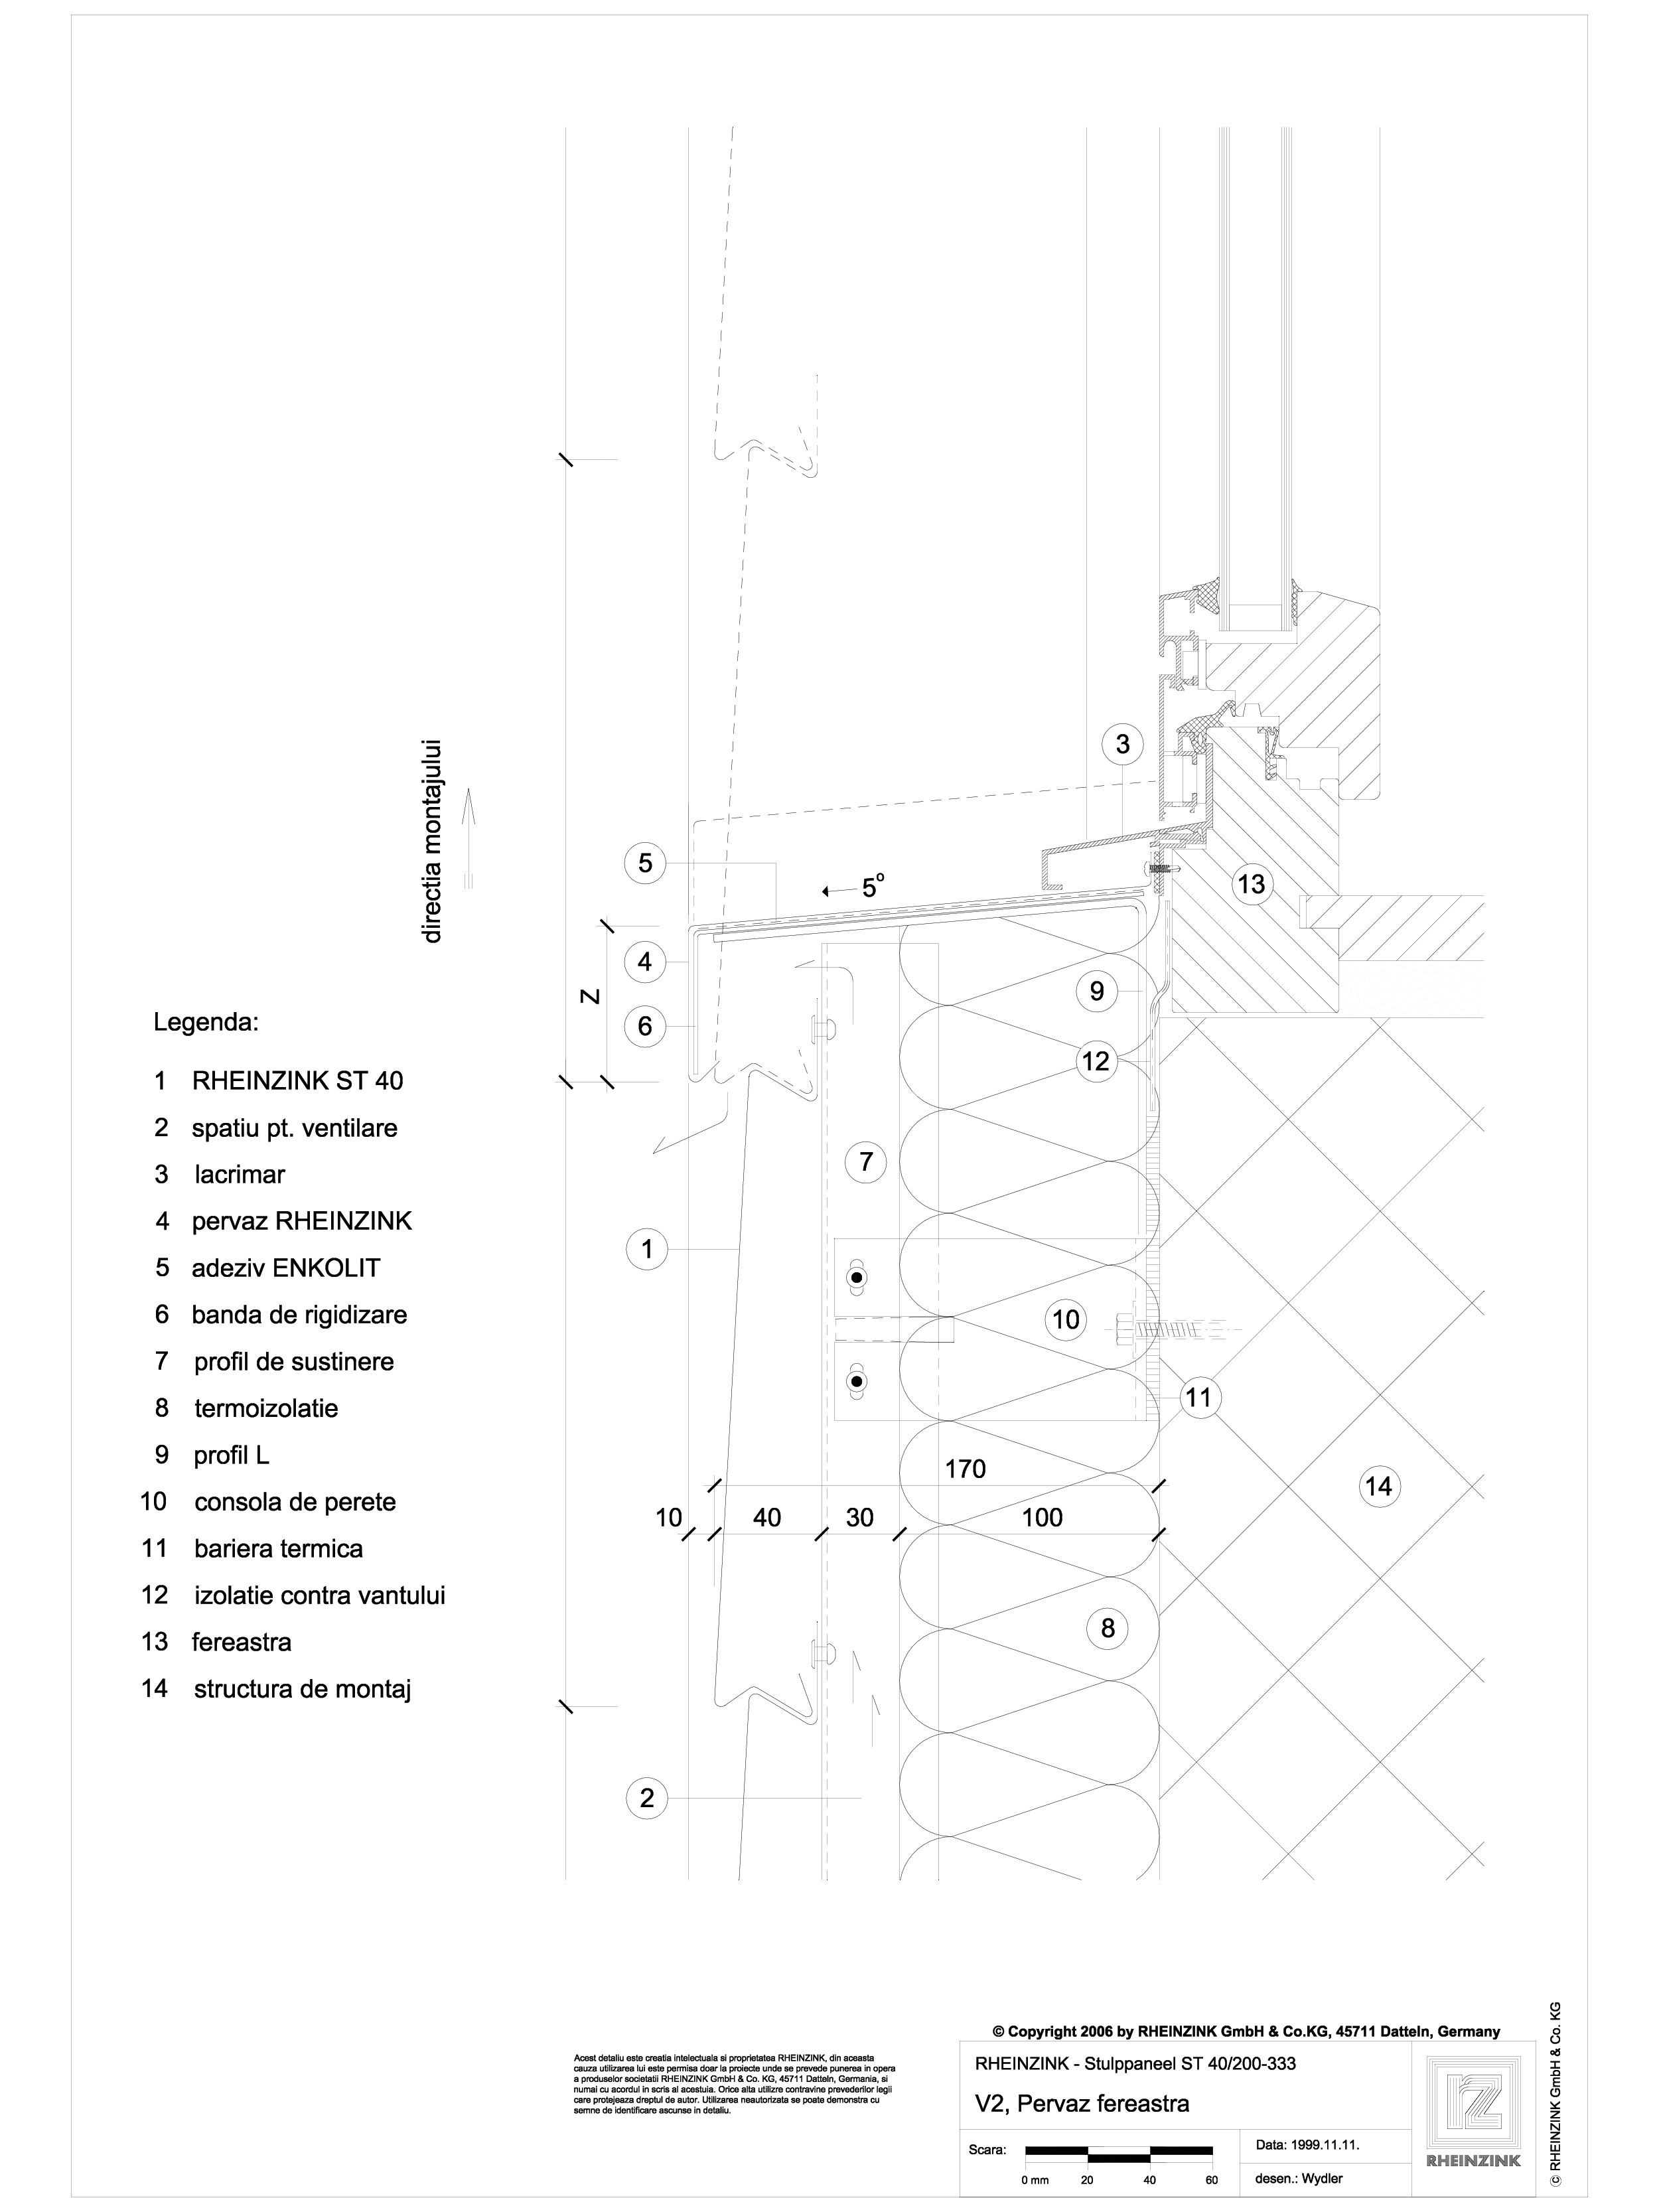 Pagina 1 - CAD-DWG V2 Pervaz fereastra iesit din planul peretelui RHEINZINK Detaliu de montaj Stulp